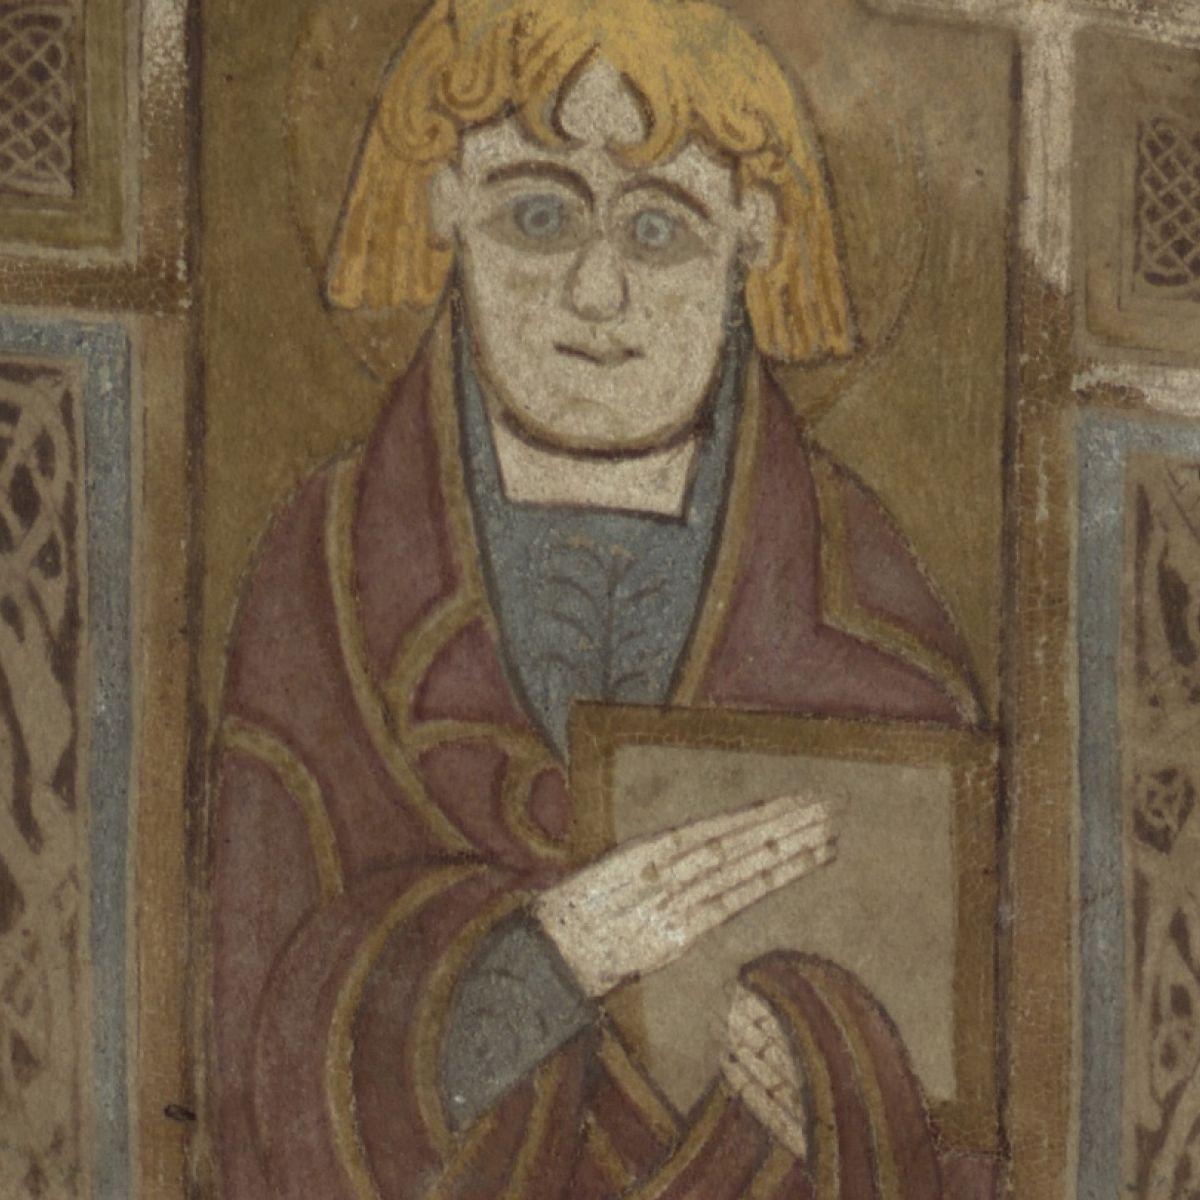 Abbey of Kells - Wikipedia